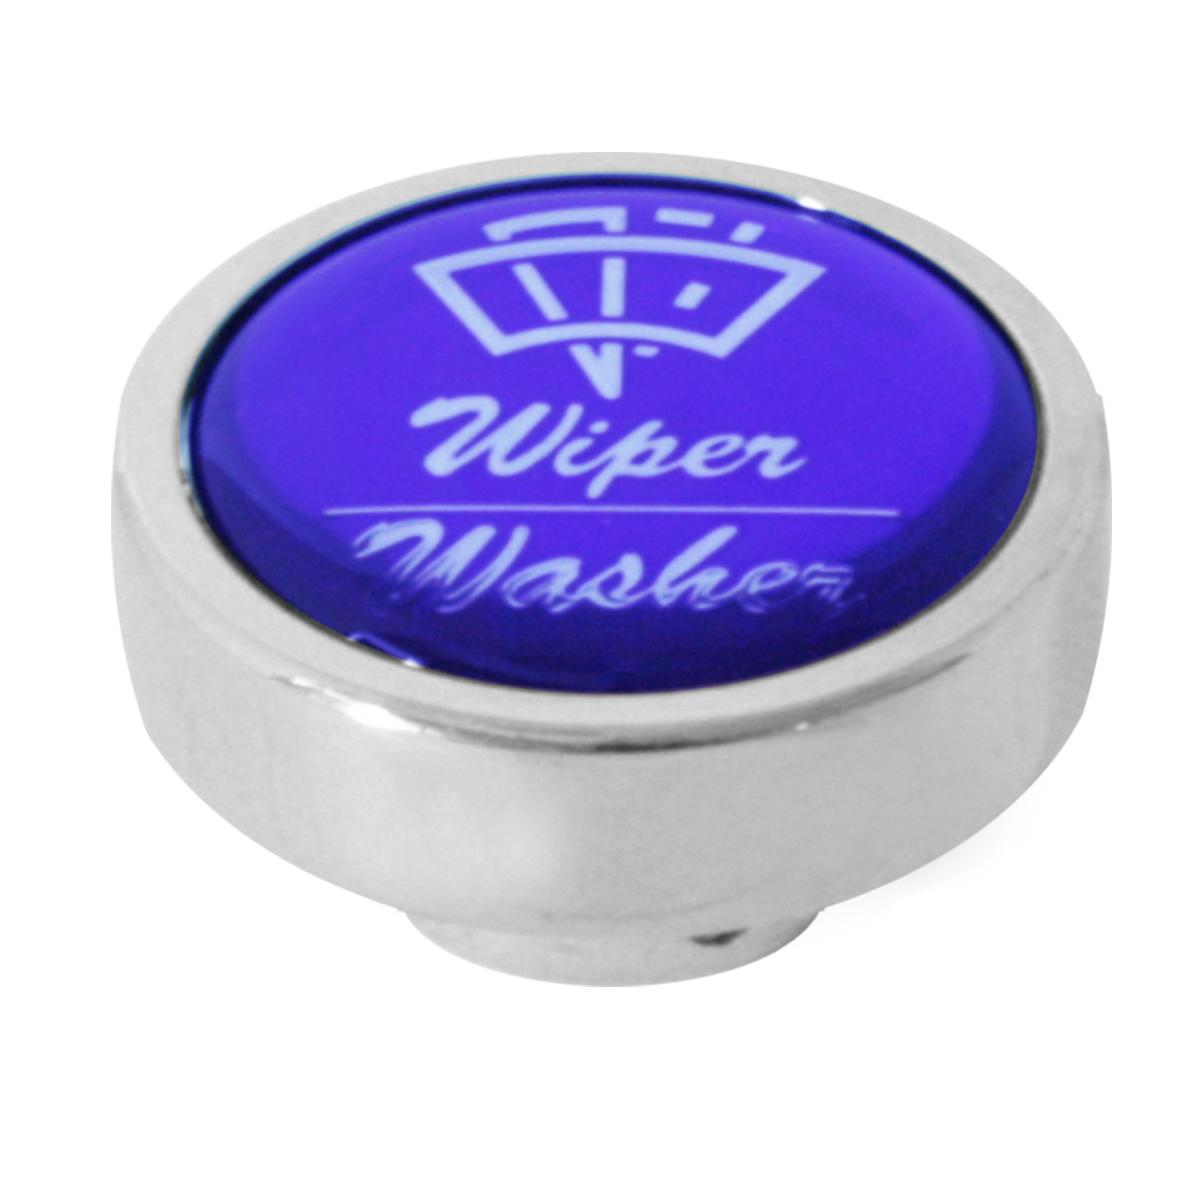 96584 Dashboard Control Knob w/ Wiper/Washer Script